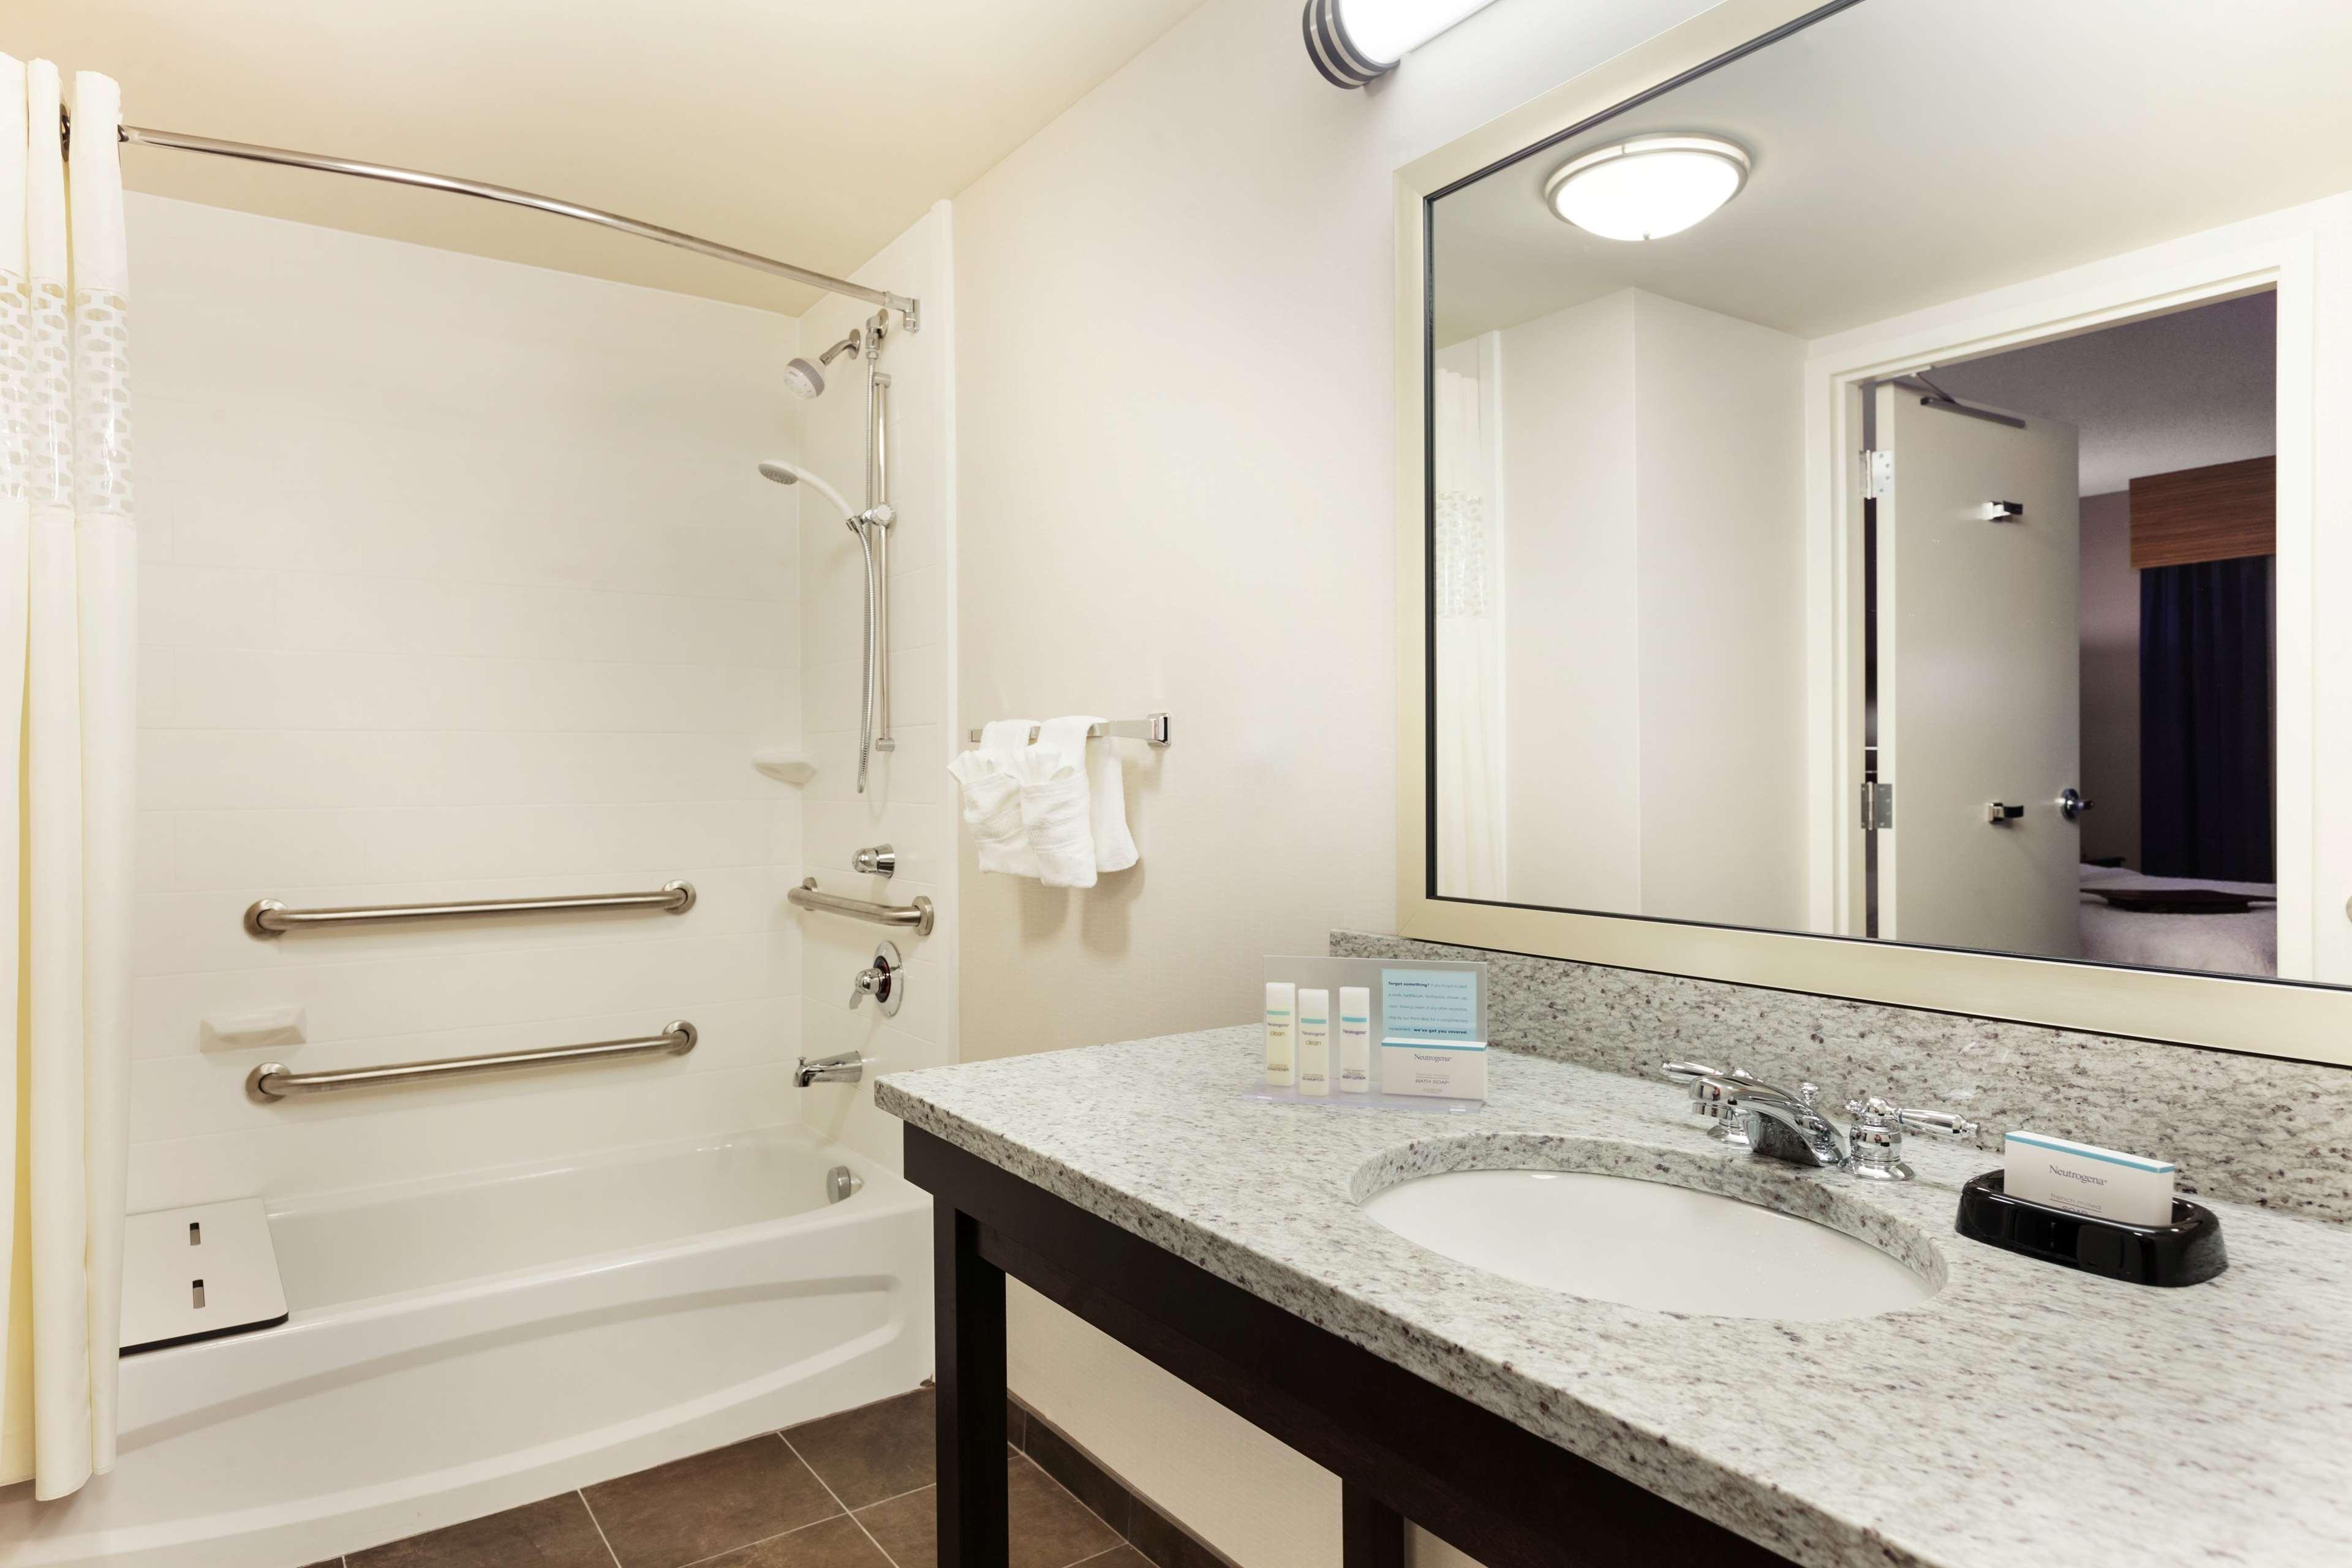 Hampton Inn & Suites Camp Springs/Andrews AFB image 8